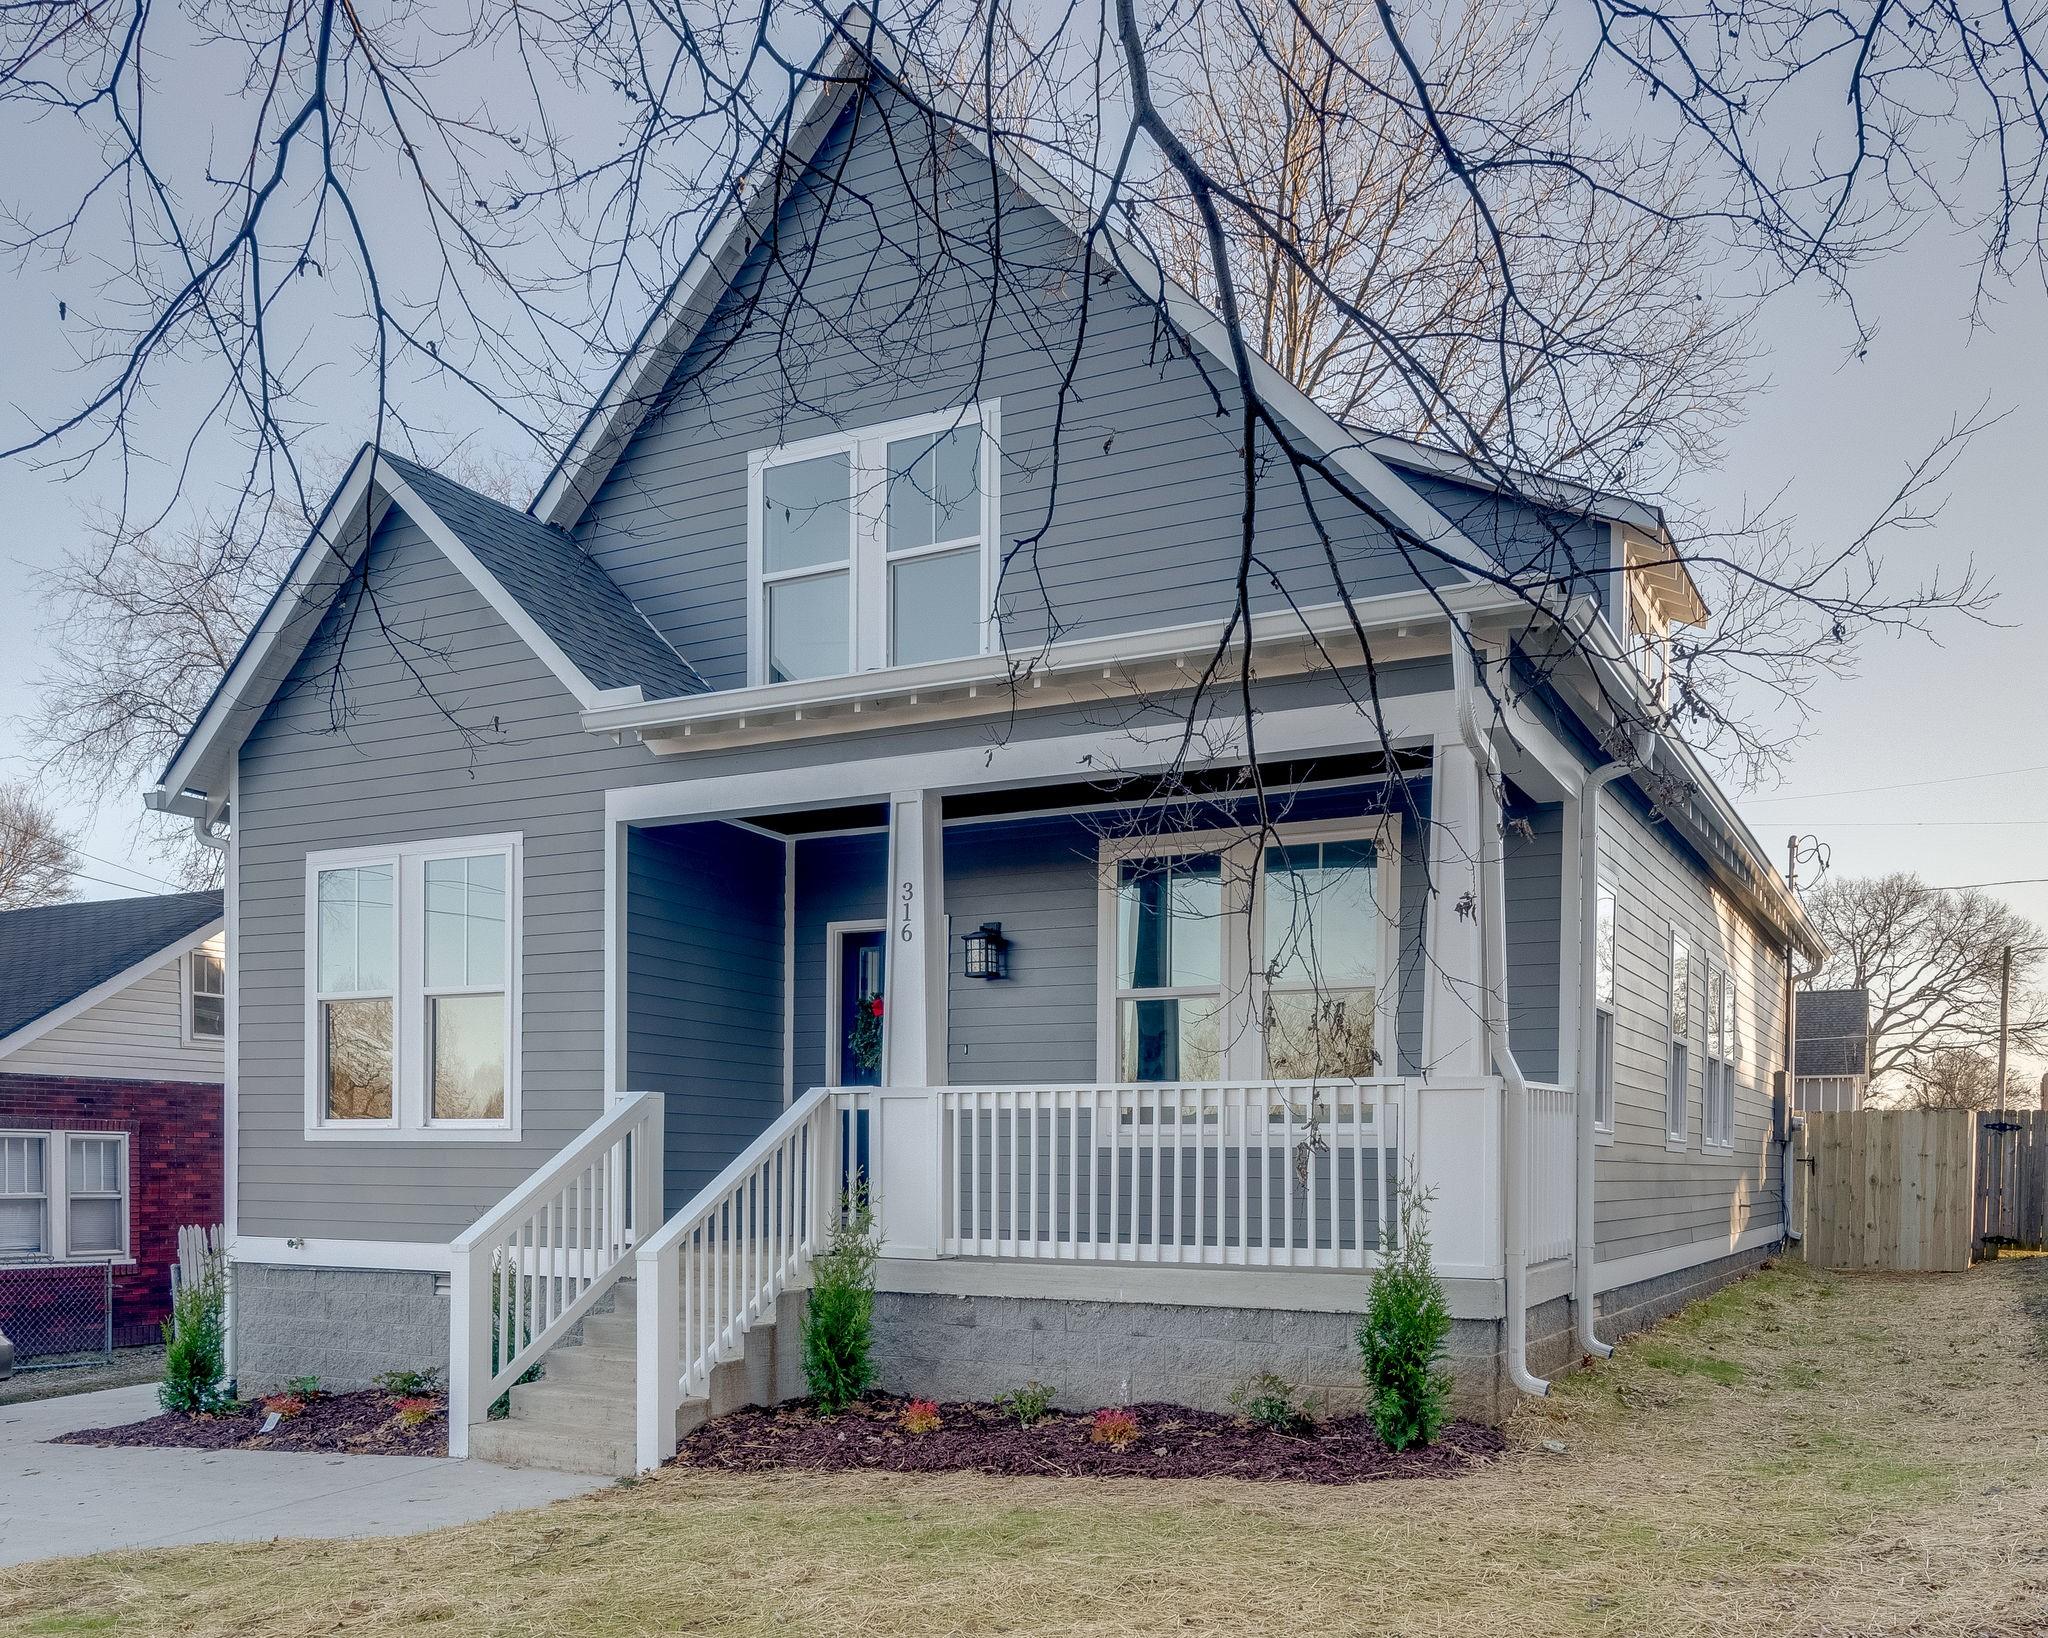 316 Pullen Ave, Nashville, TN 37207 - Nashville, TN real estate listing